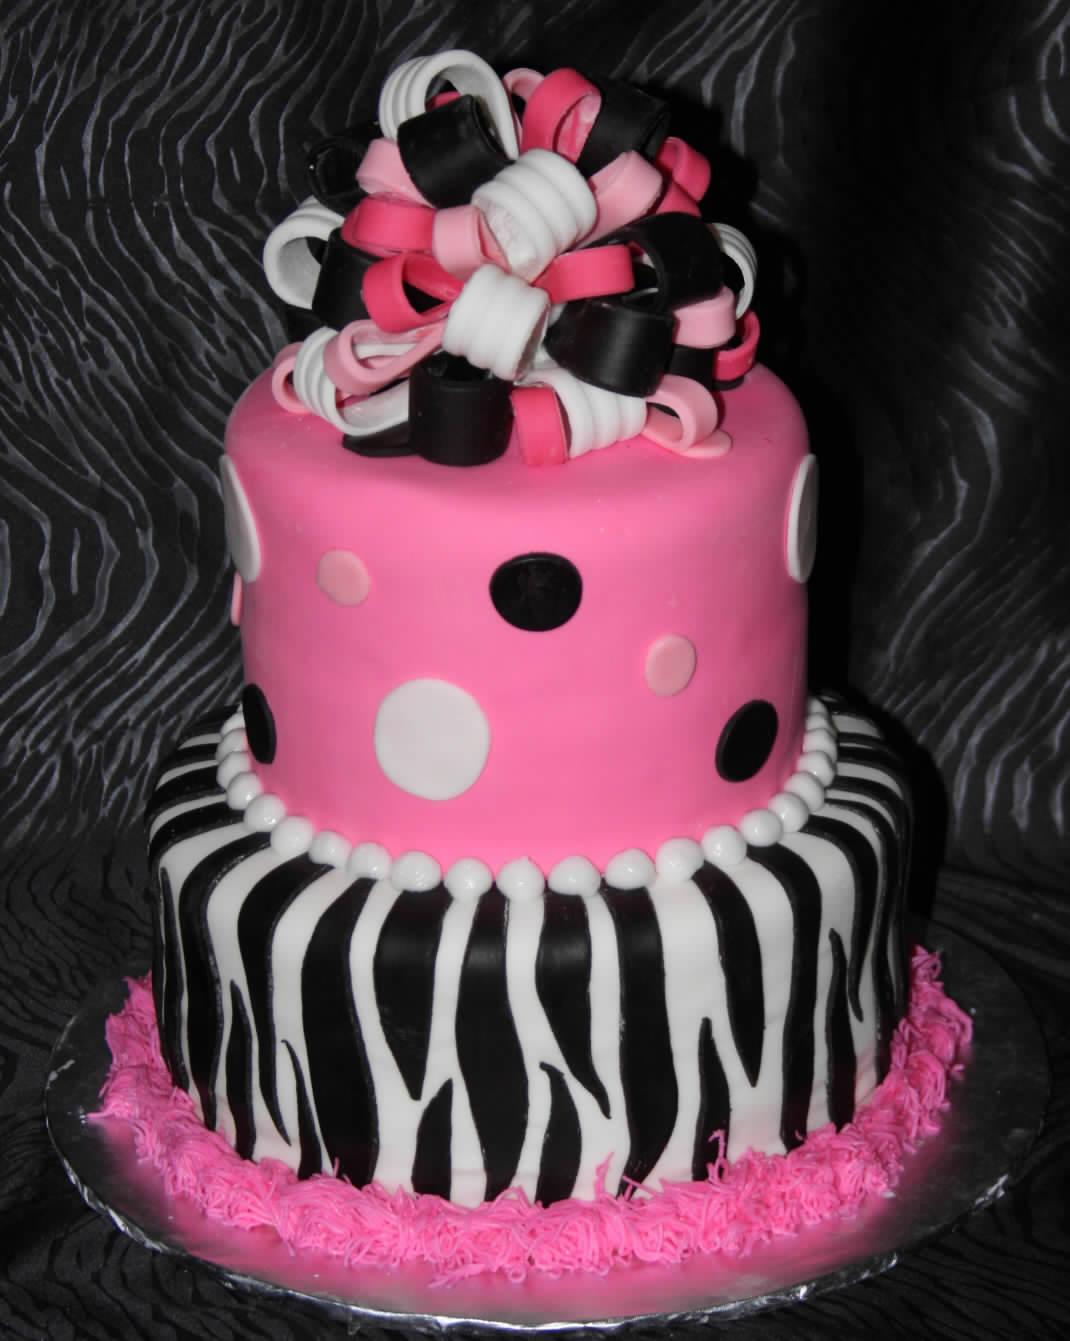 Wondrous Birthday Cake Photo Directory Page 449 Snackncake Funny Birthday Cards Online Chimdamsfinfo